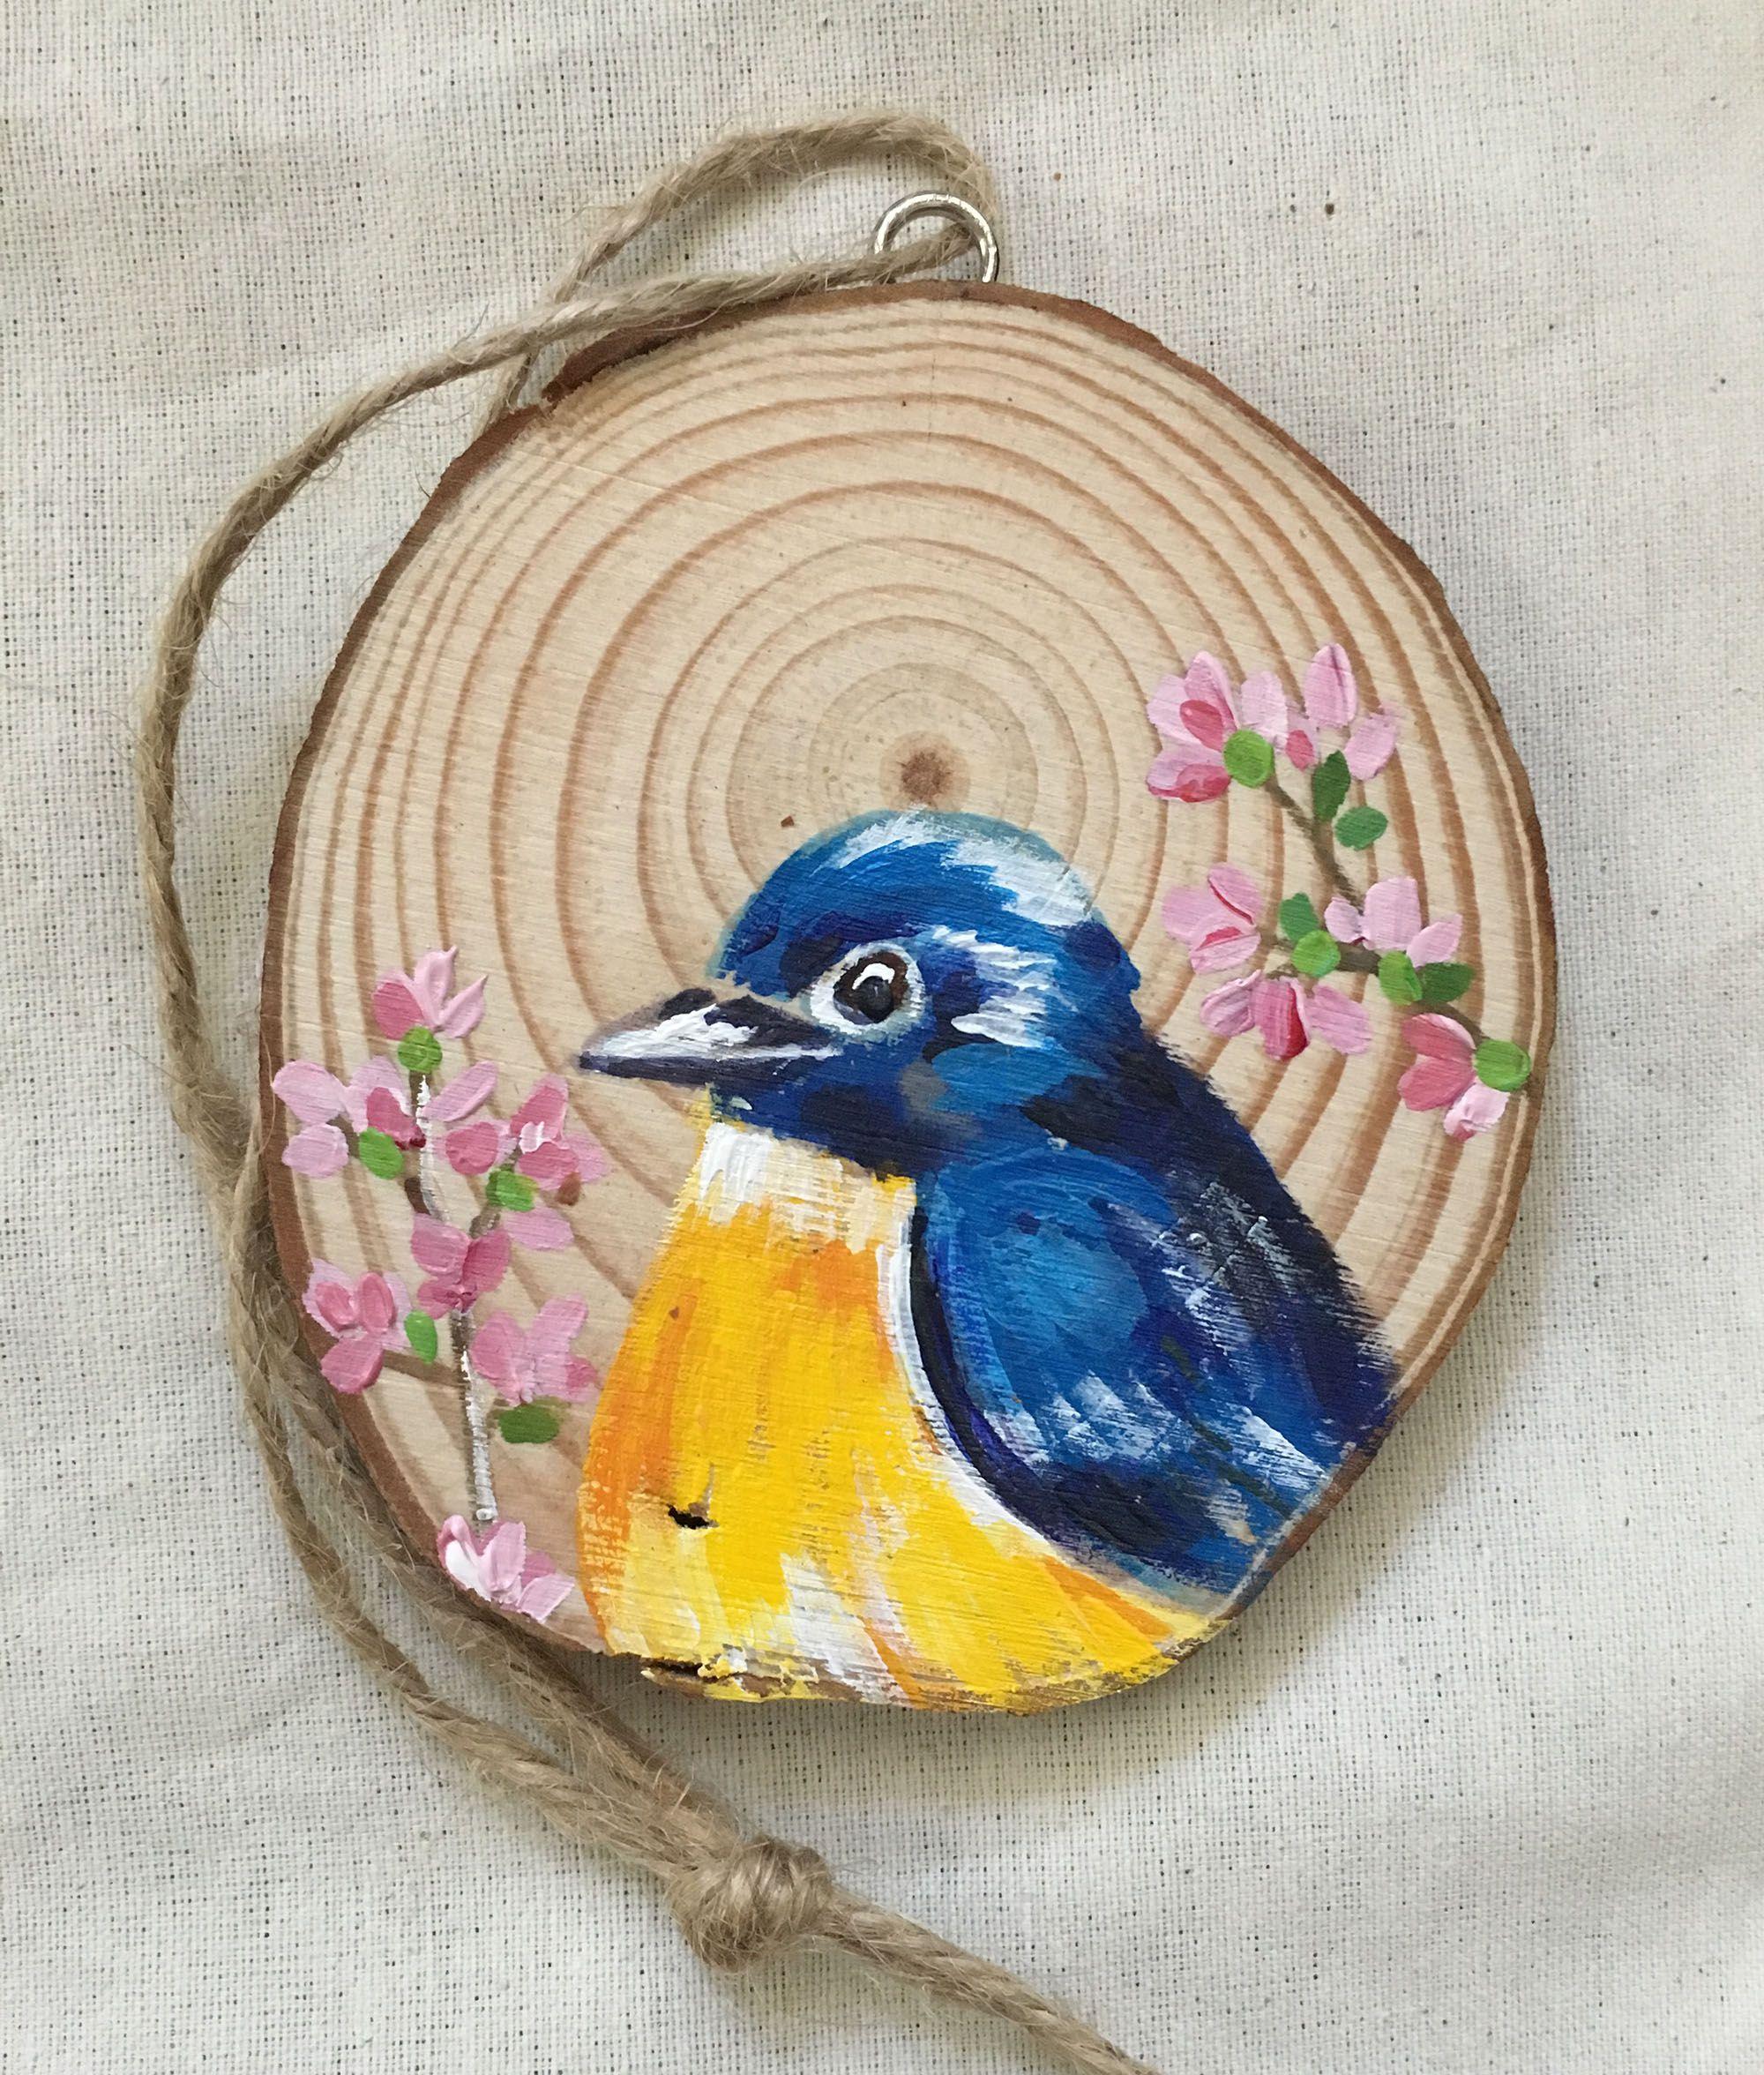 handmade ornaments present wood unique decor christmas blue bird ornament slice